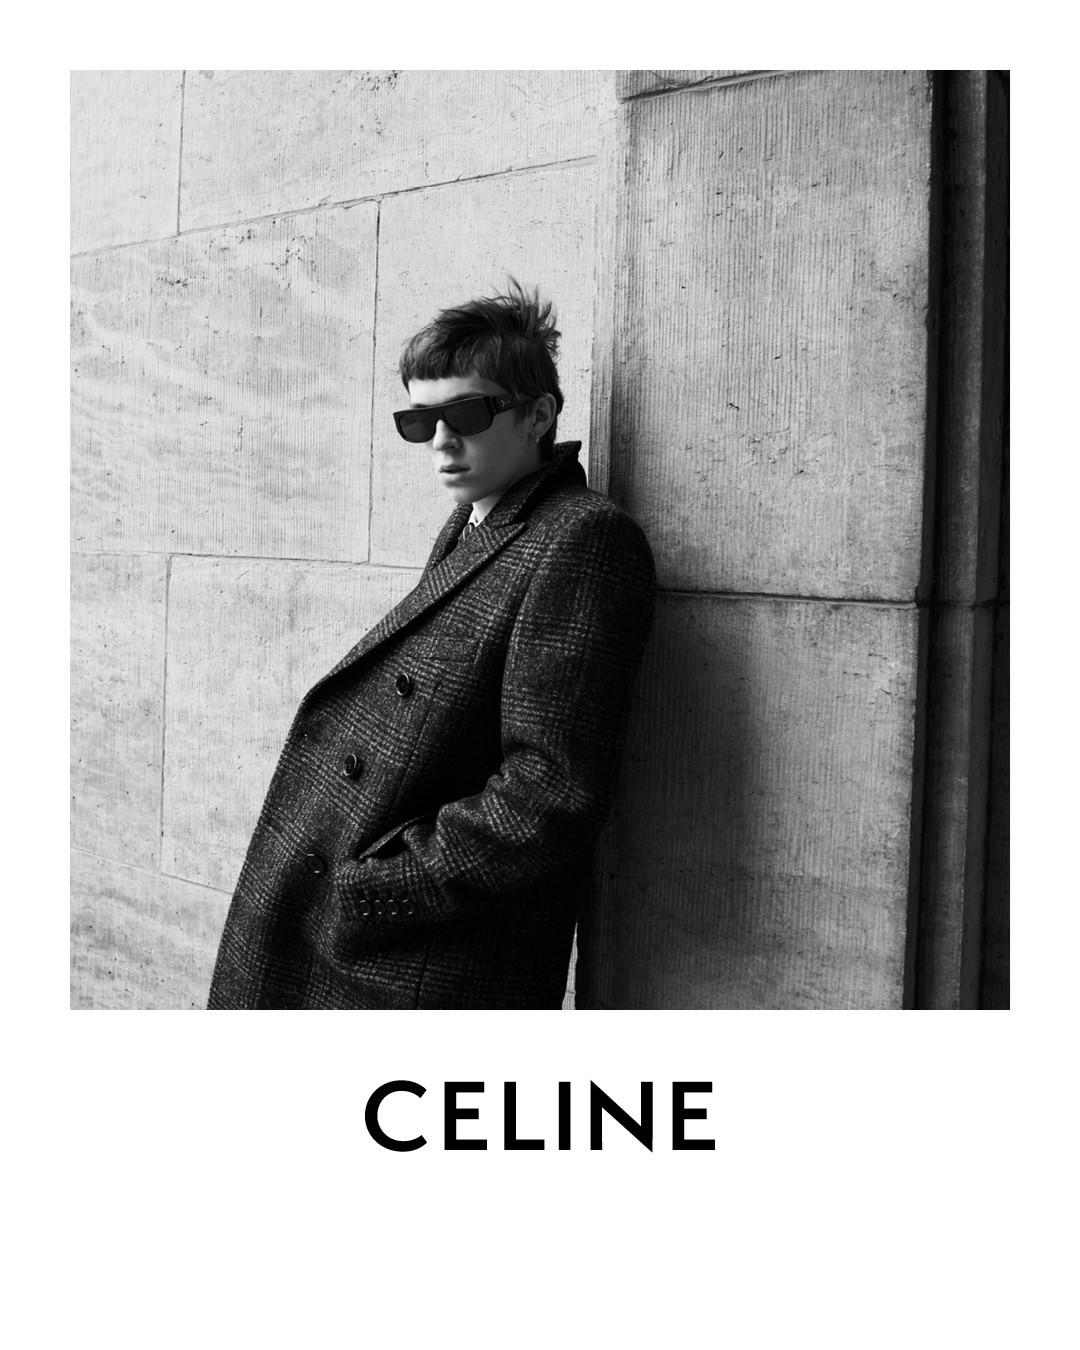 celine_mens_fall_2019_campaign1.jpg